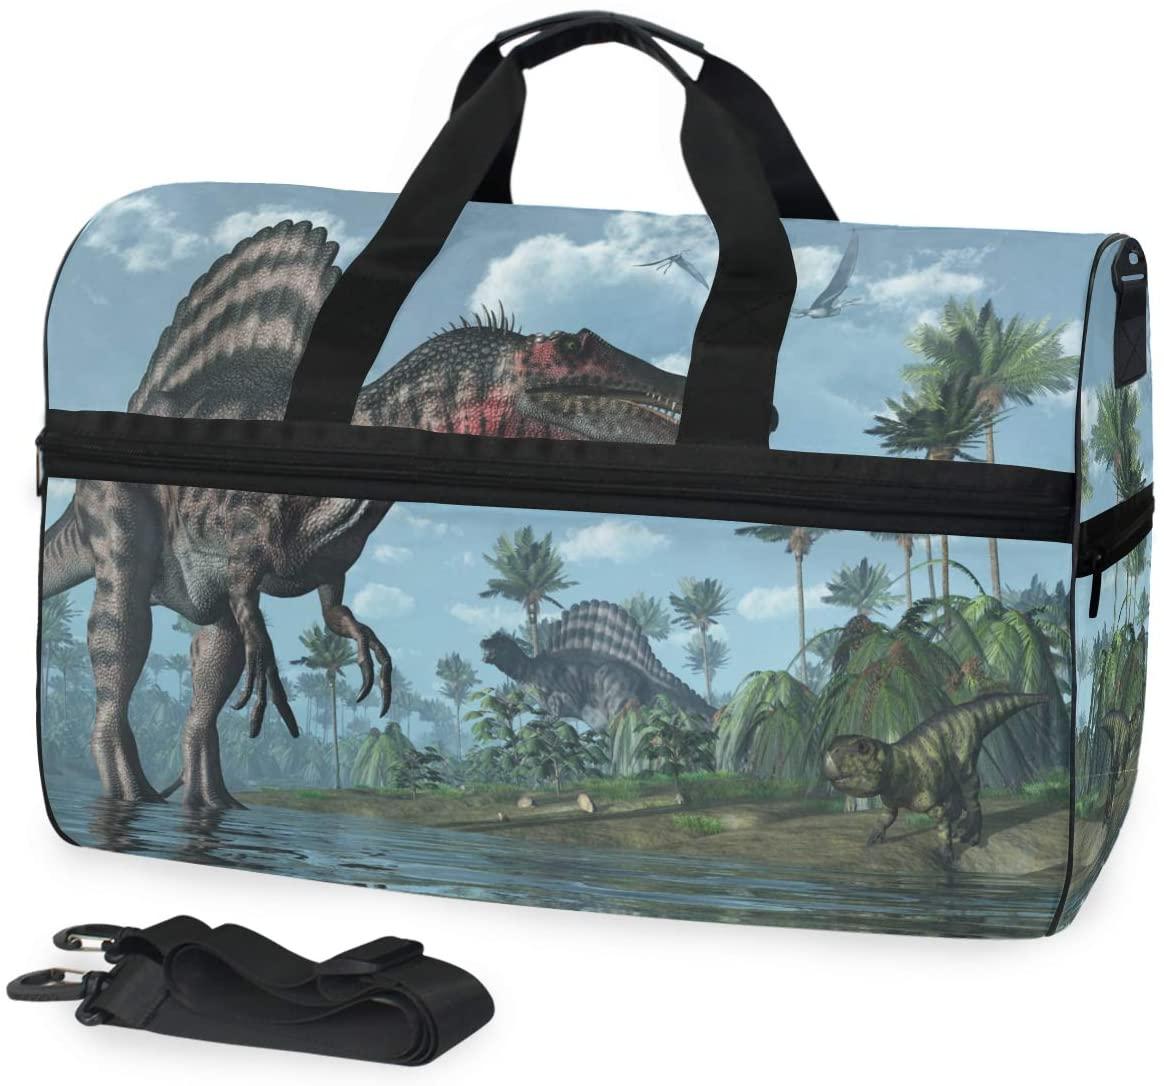 ALAZA Retro Tropical Dinosaur Sports Gym Duffel Bag Travel Luggage Handbag Shoulder Bag with Shoes Compartment for Men Women